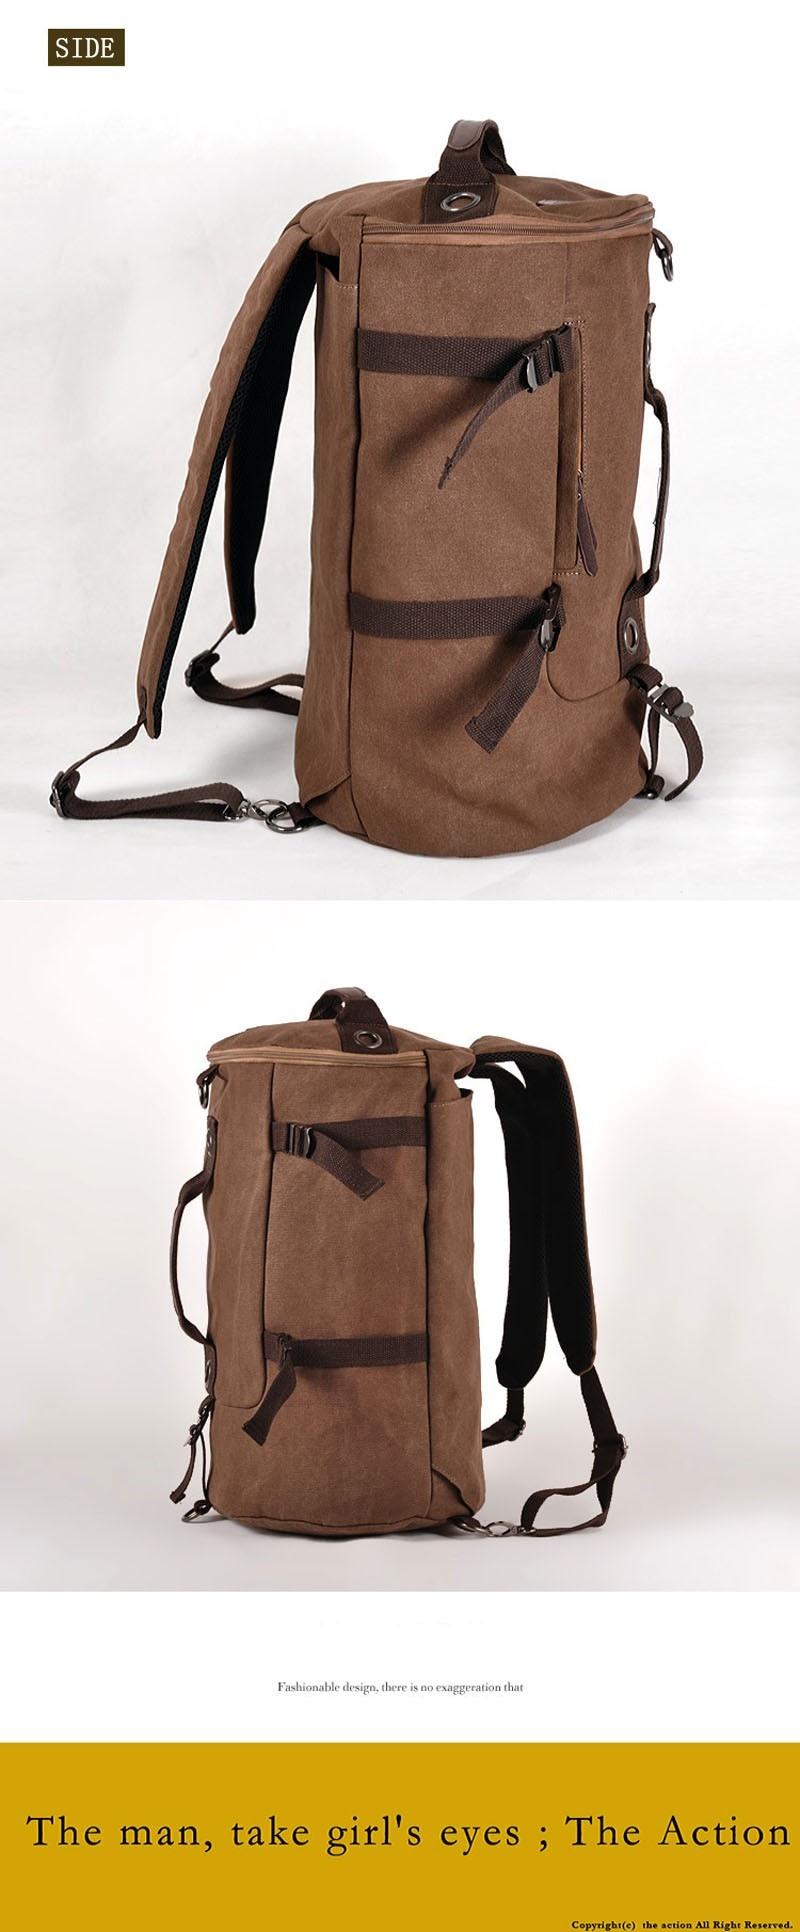 Men's Multi-Functional Backpack Vintage Shoulder Bag High Quality Canvas Male Bagpack Rucksack Travel Luggage for Weekend 31